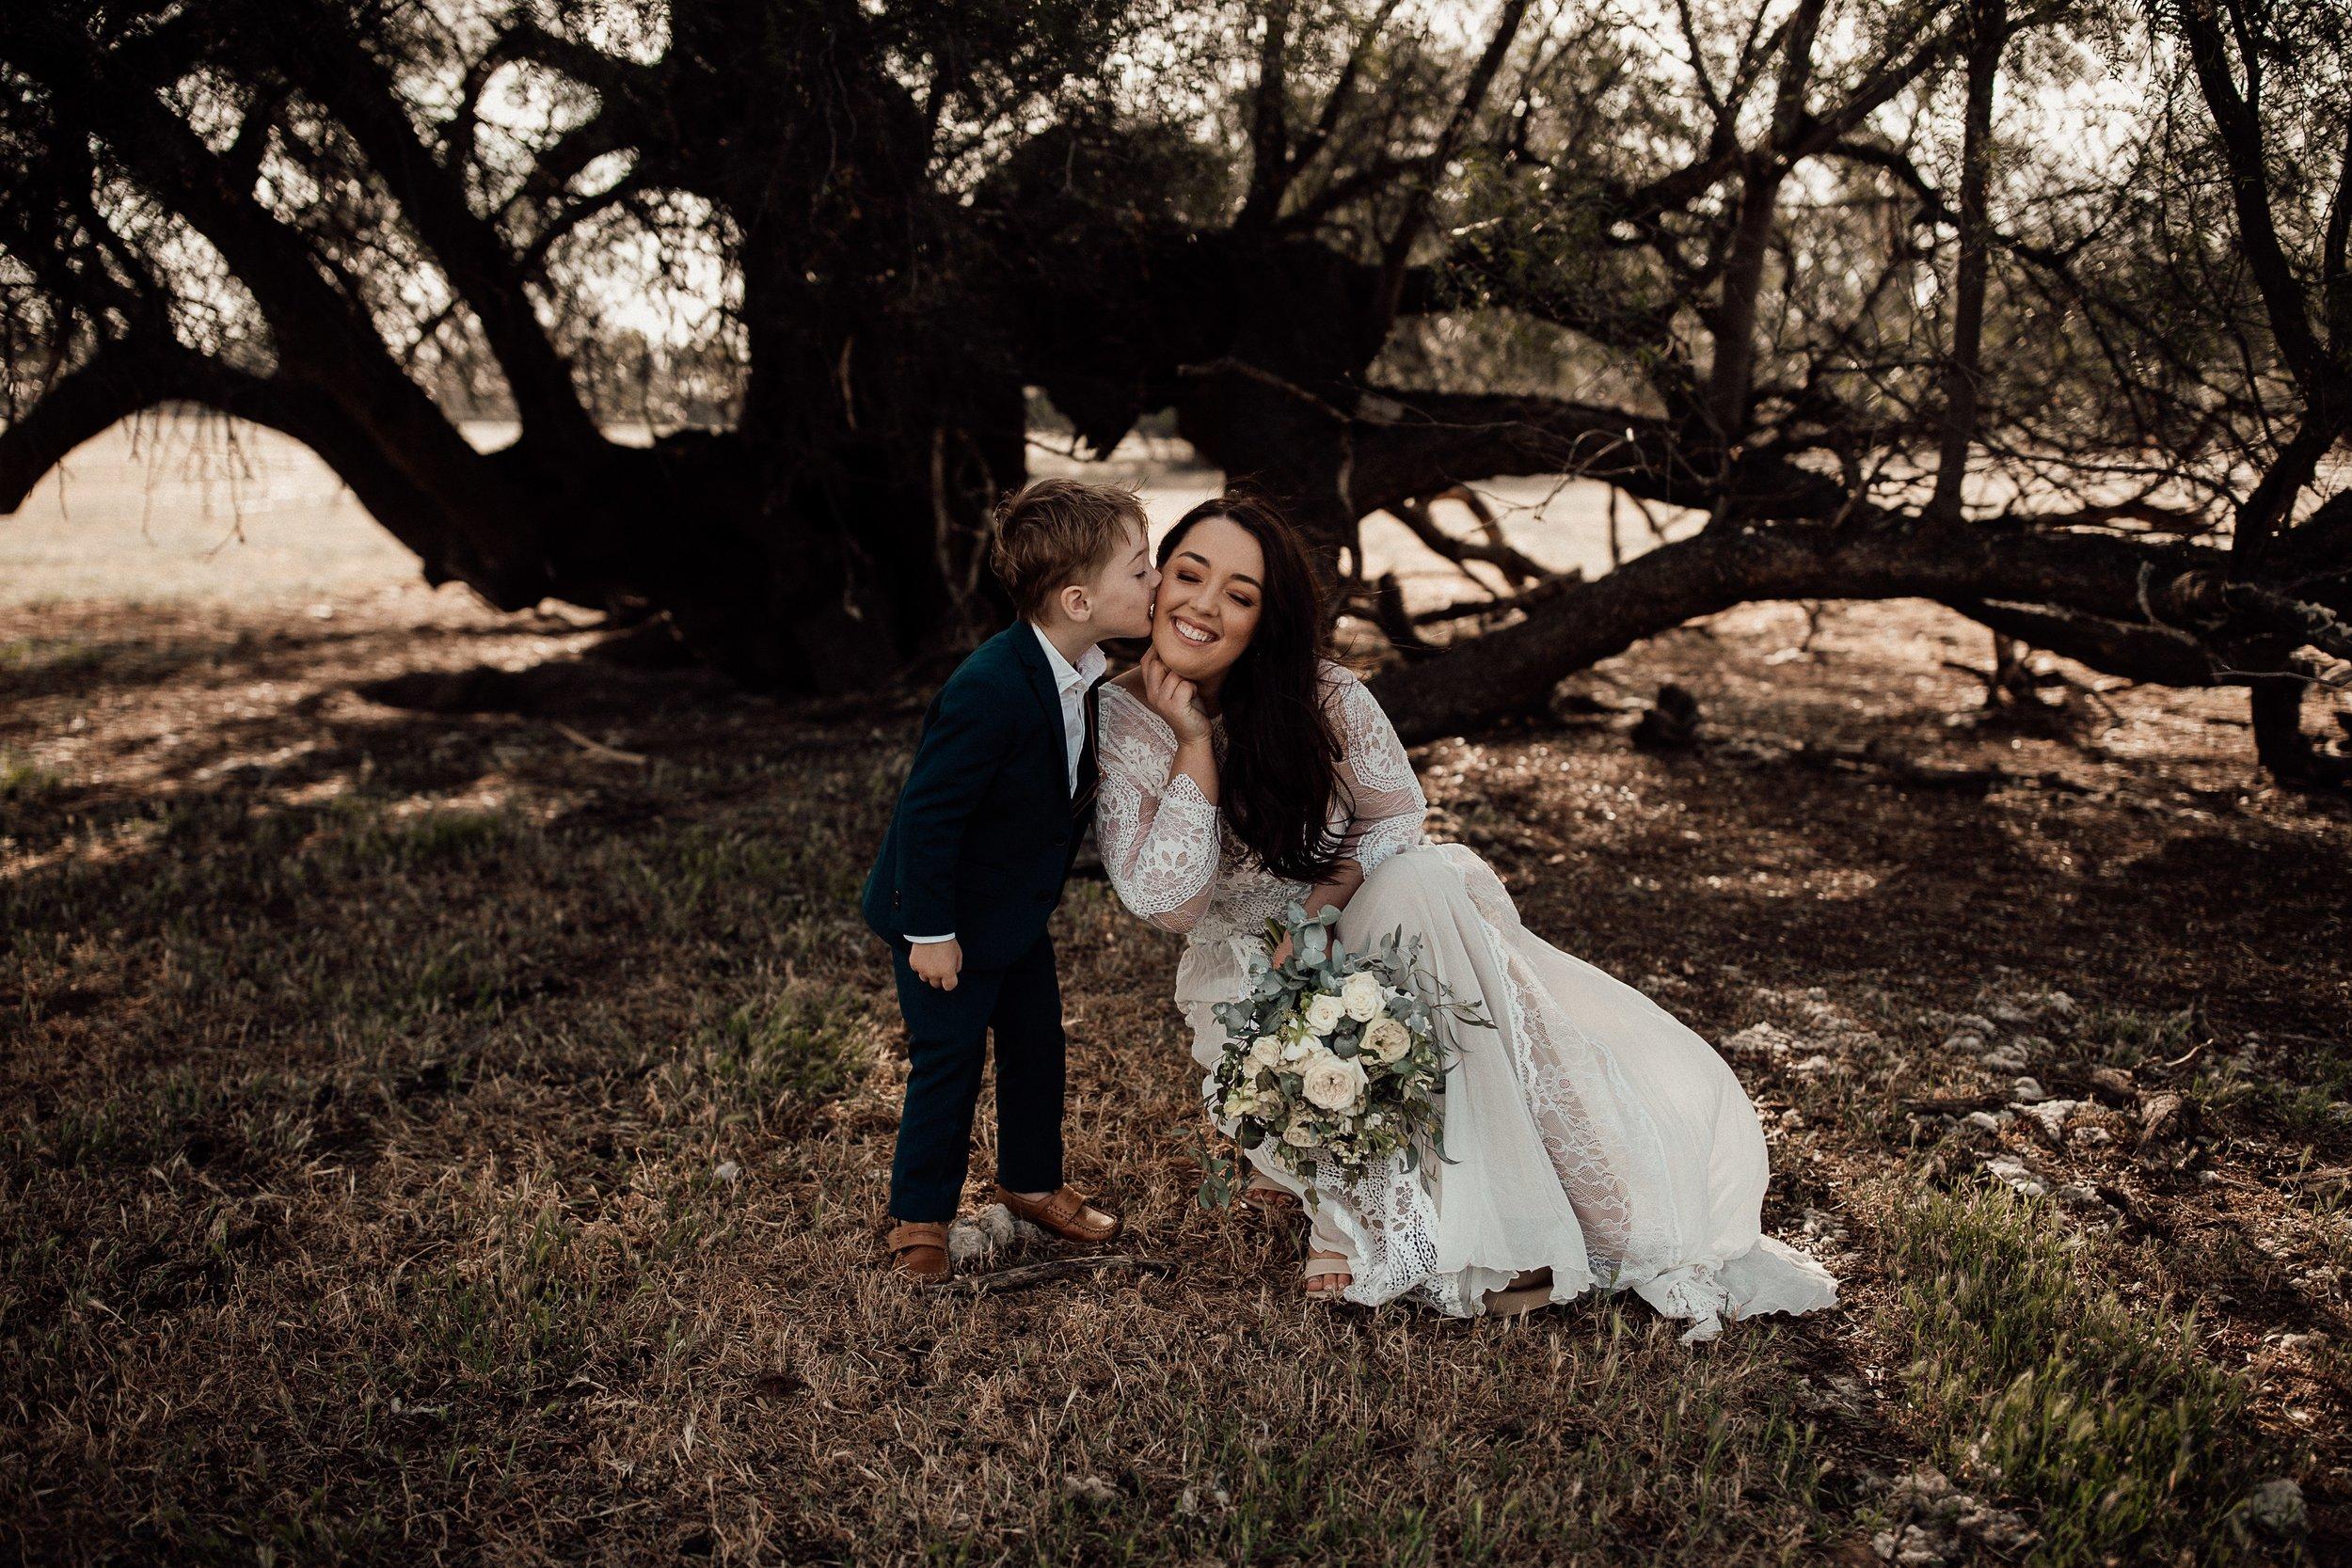 mickalathomas_puremacphotography_weddingphotographer_couplephotographer_Sheppartonphotographer_1511.jpg